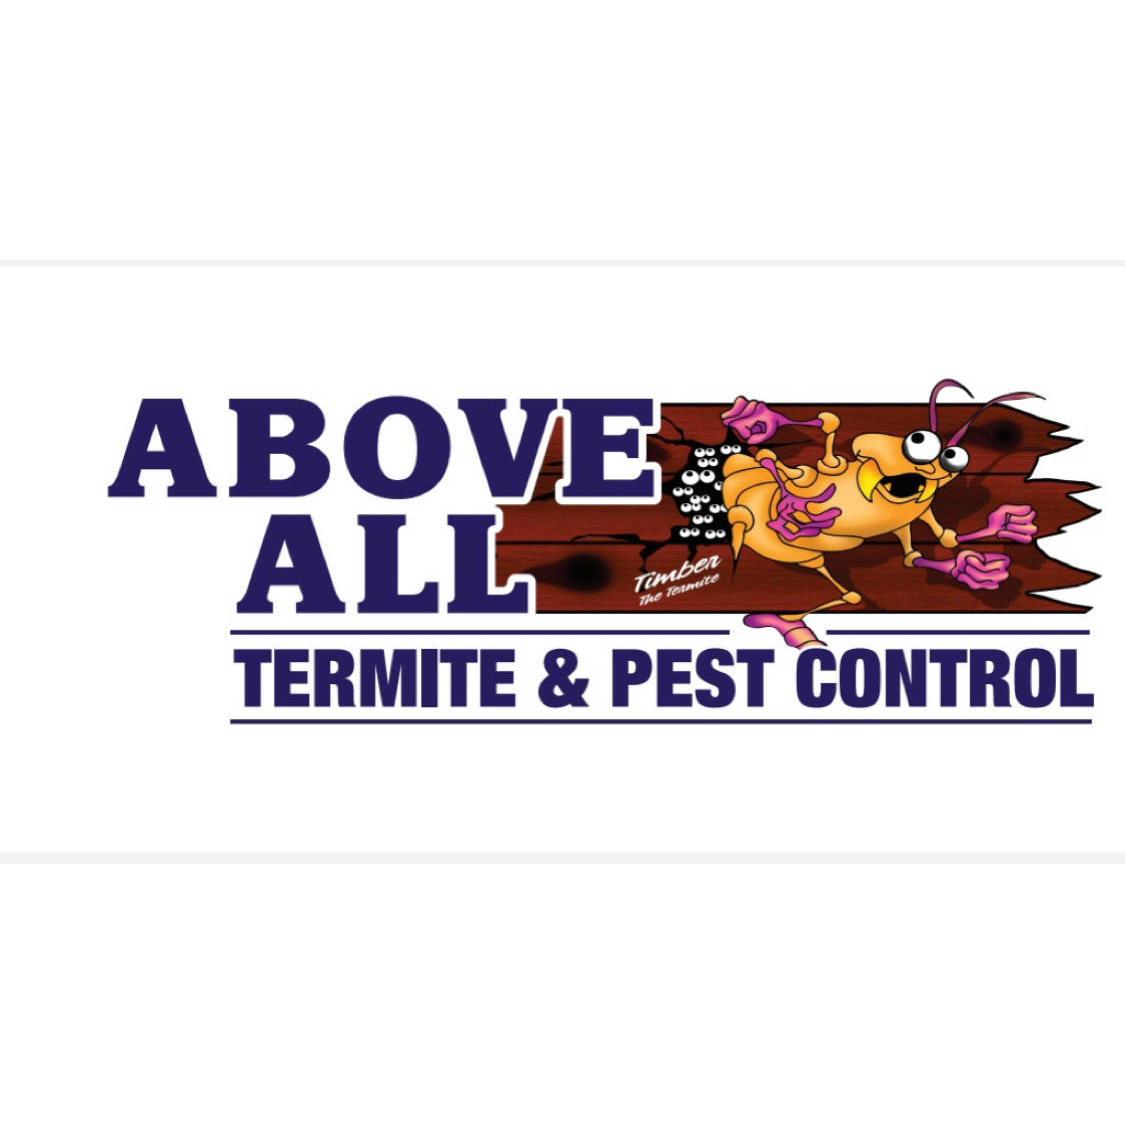 Above All Termite & Pest Control